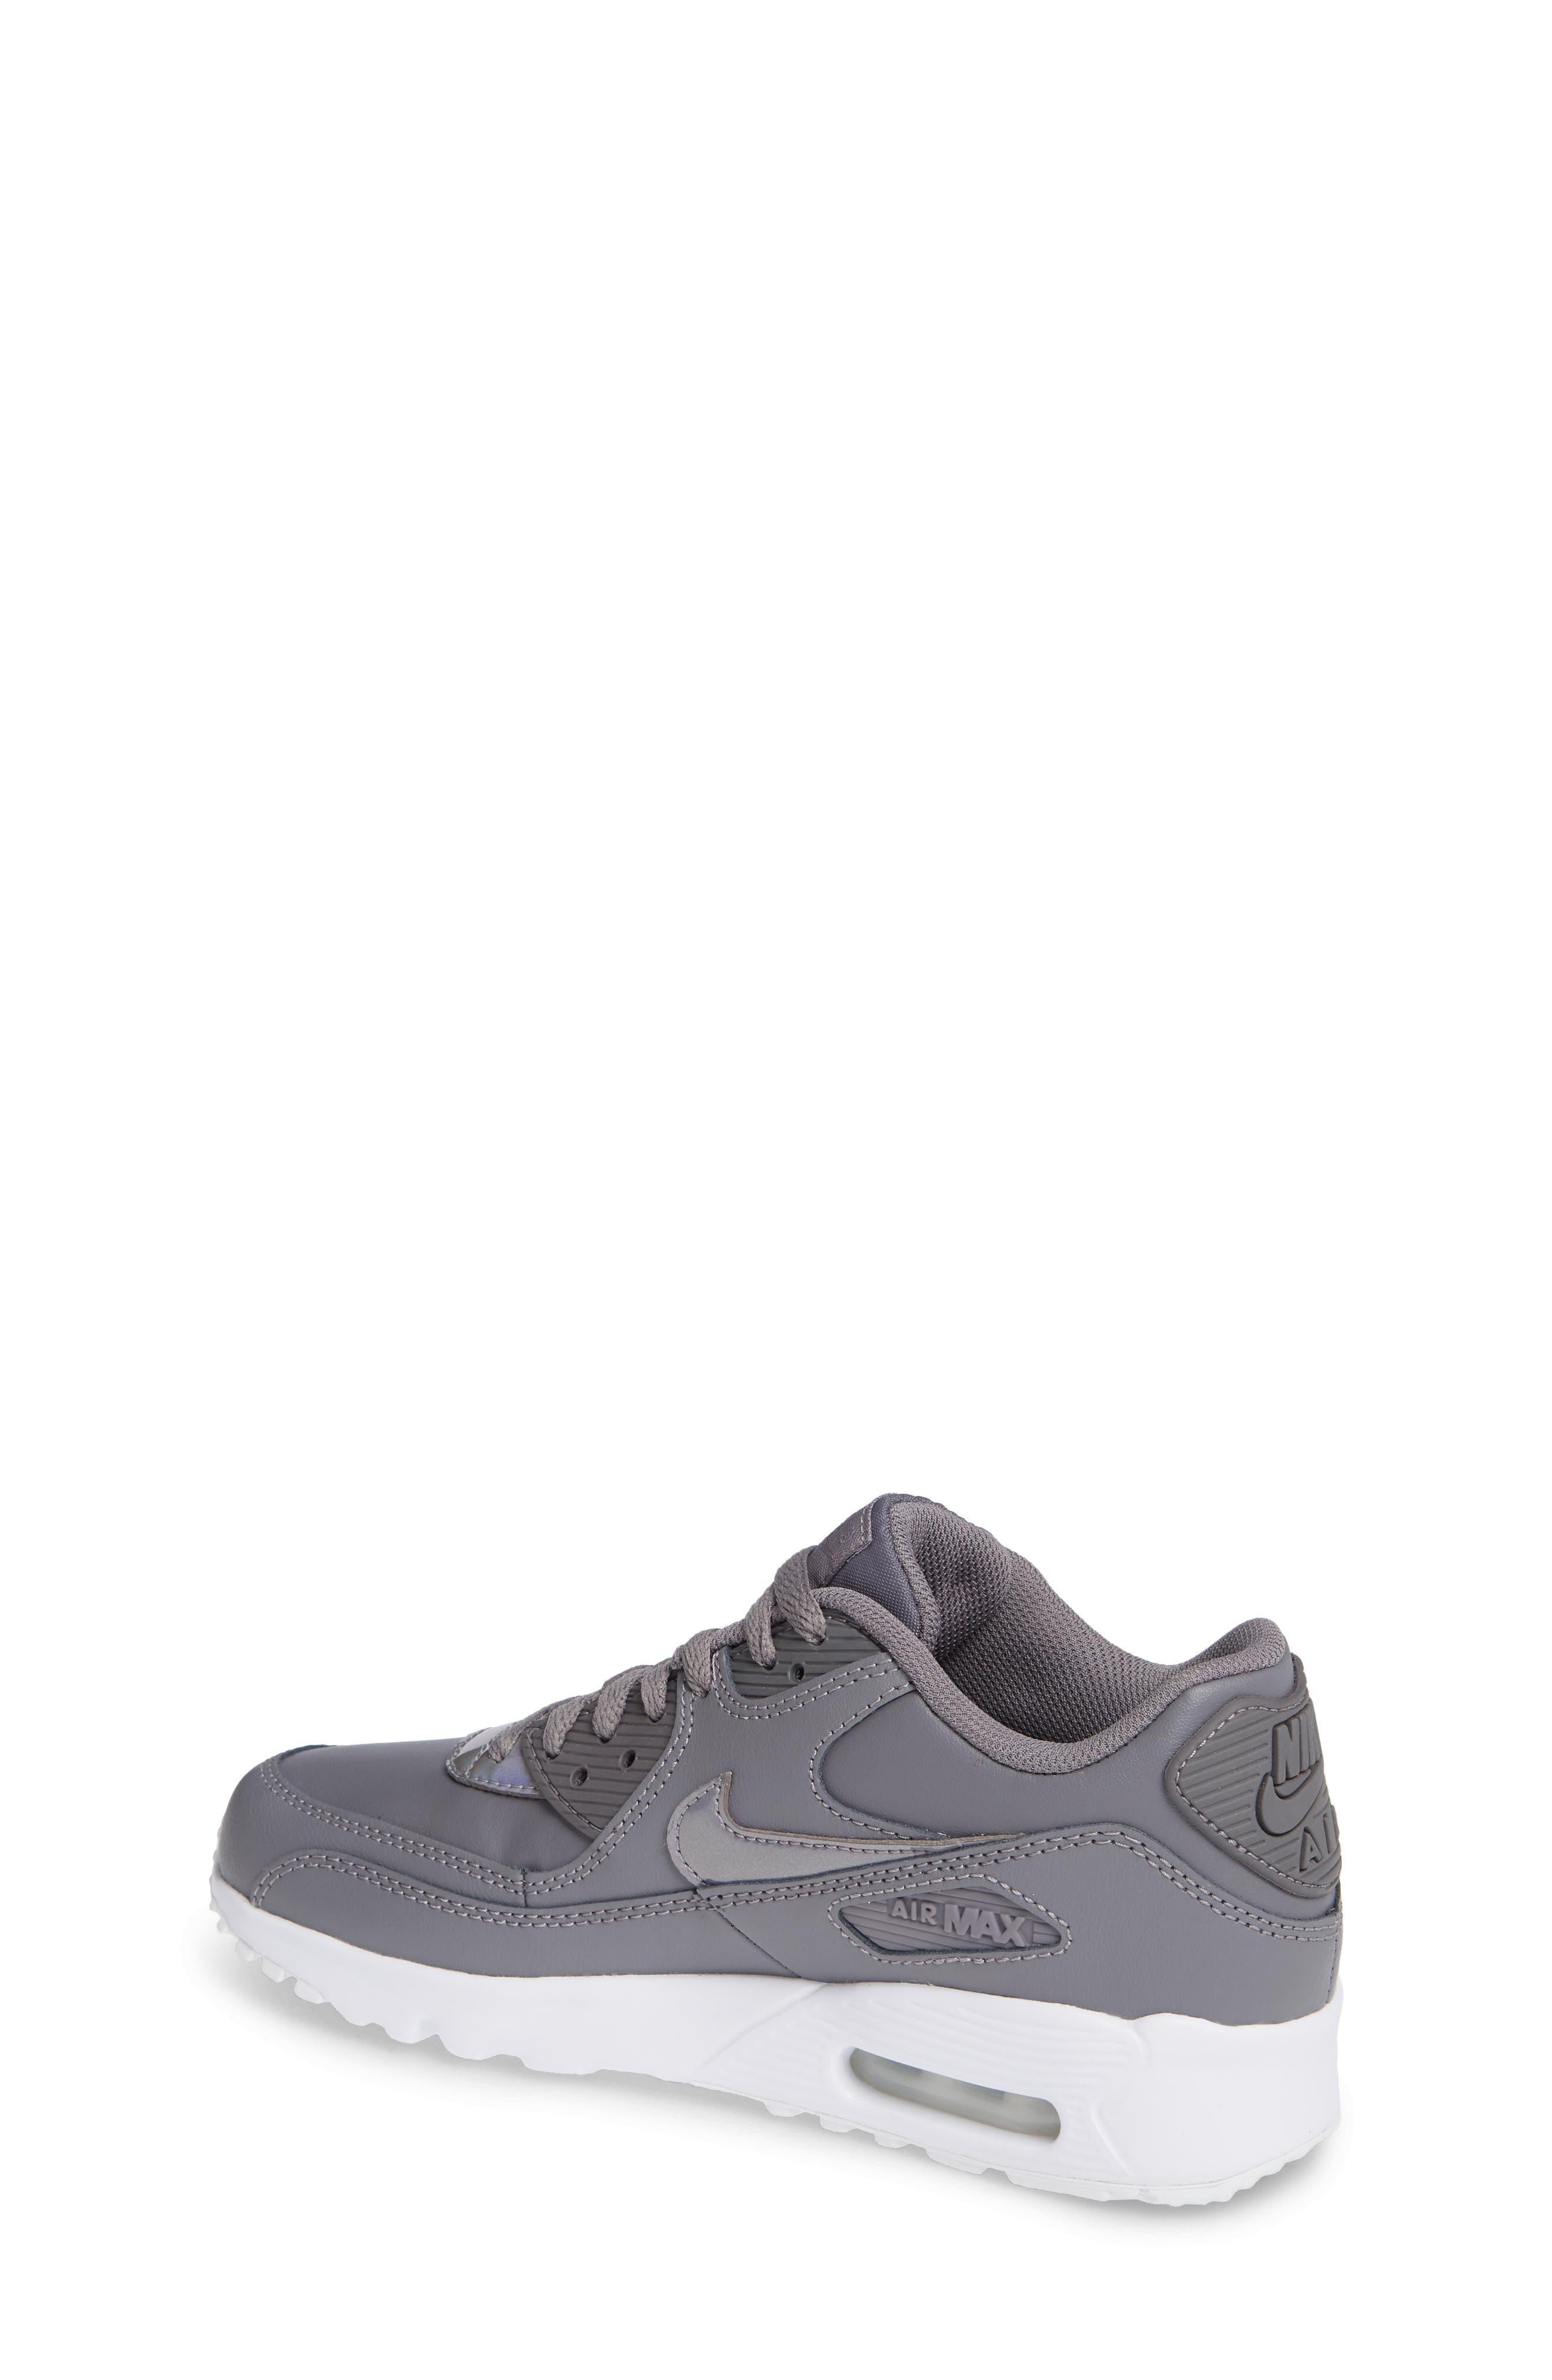 'Air Max 90' Sneaker,                             Alternate thumbnail 2, color,                             GUNSMOKE/ WHITE